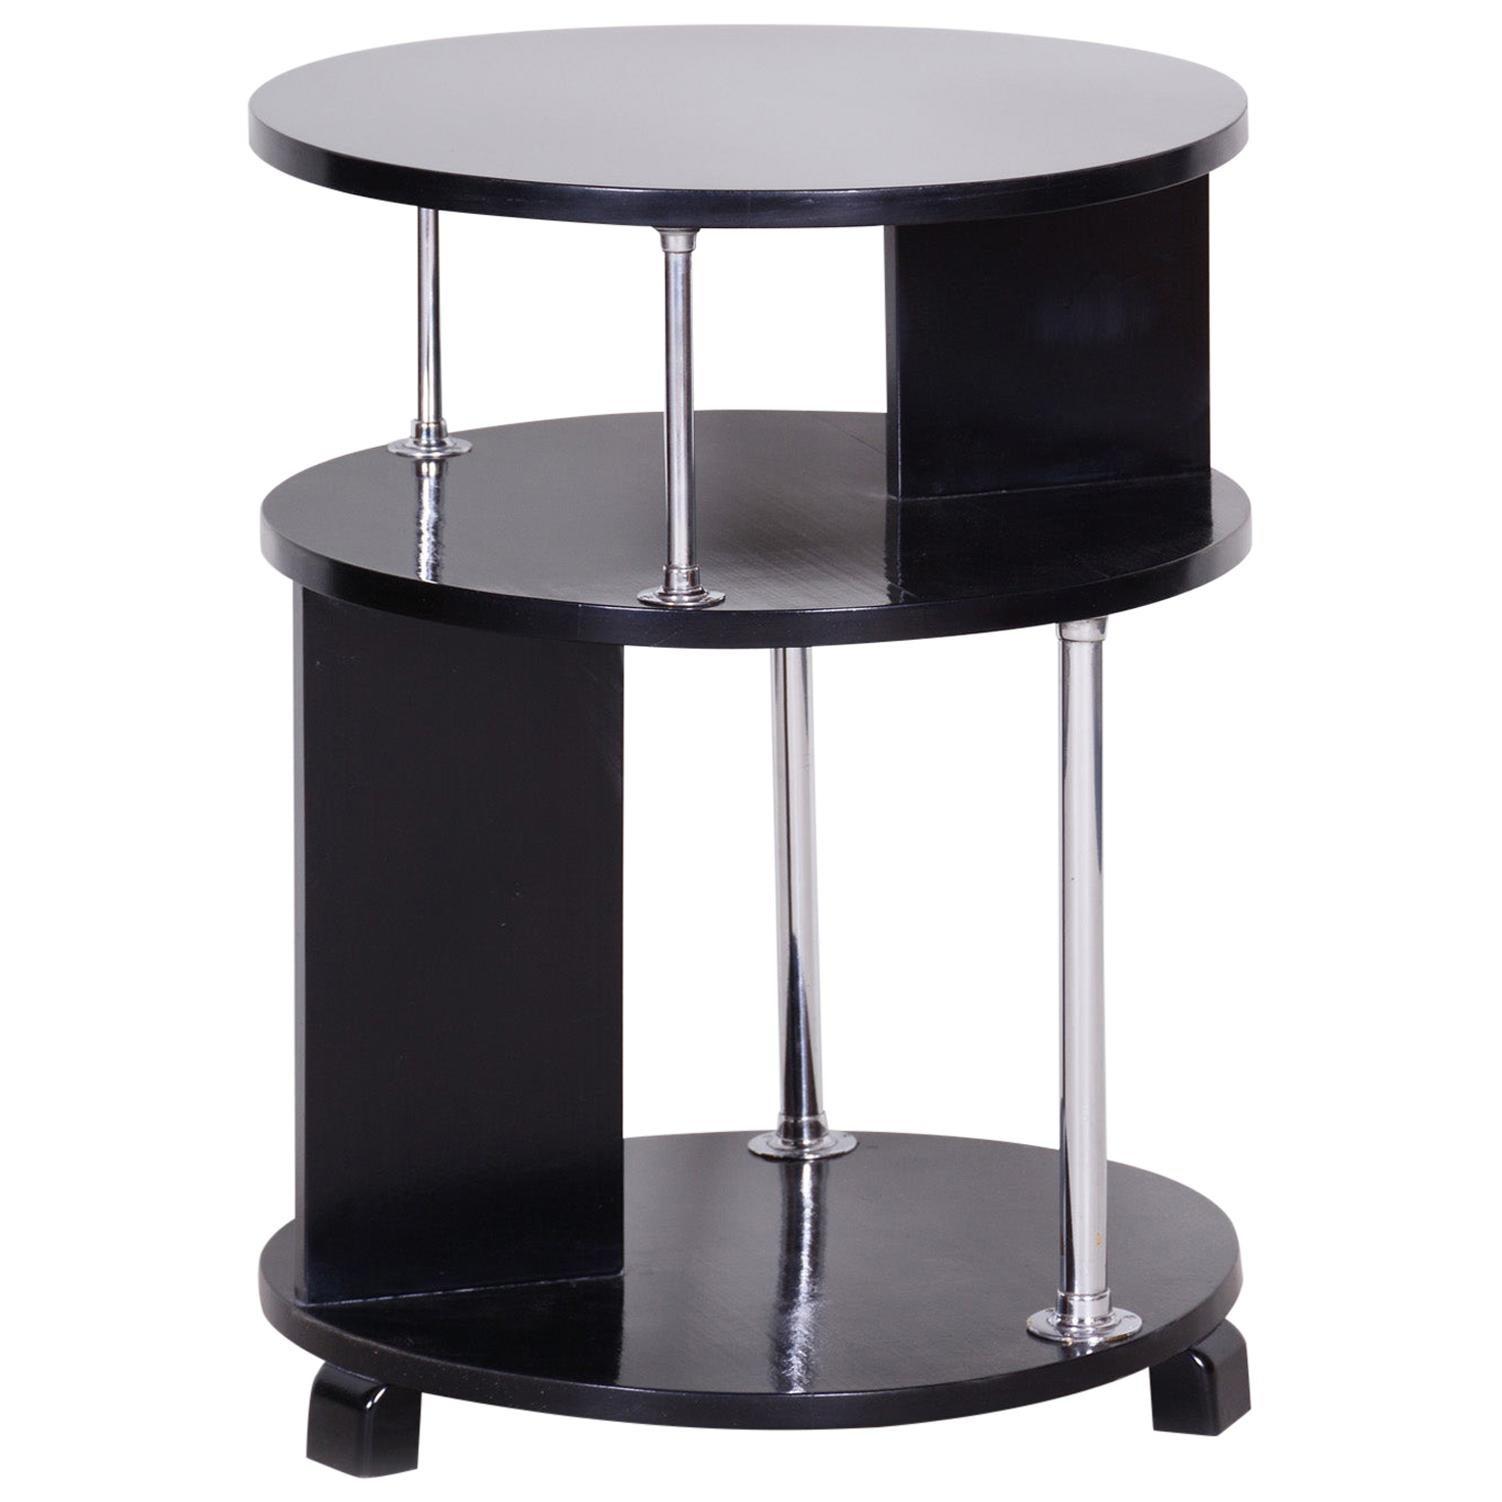 Unusual Small Czech Restored Round Black Beech Chrome Bauhaus Table, 1930s